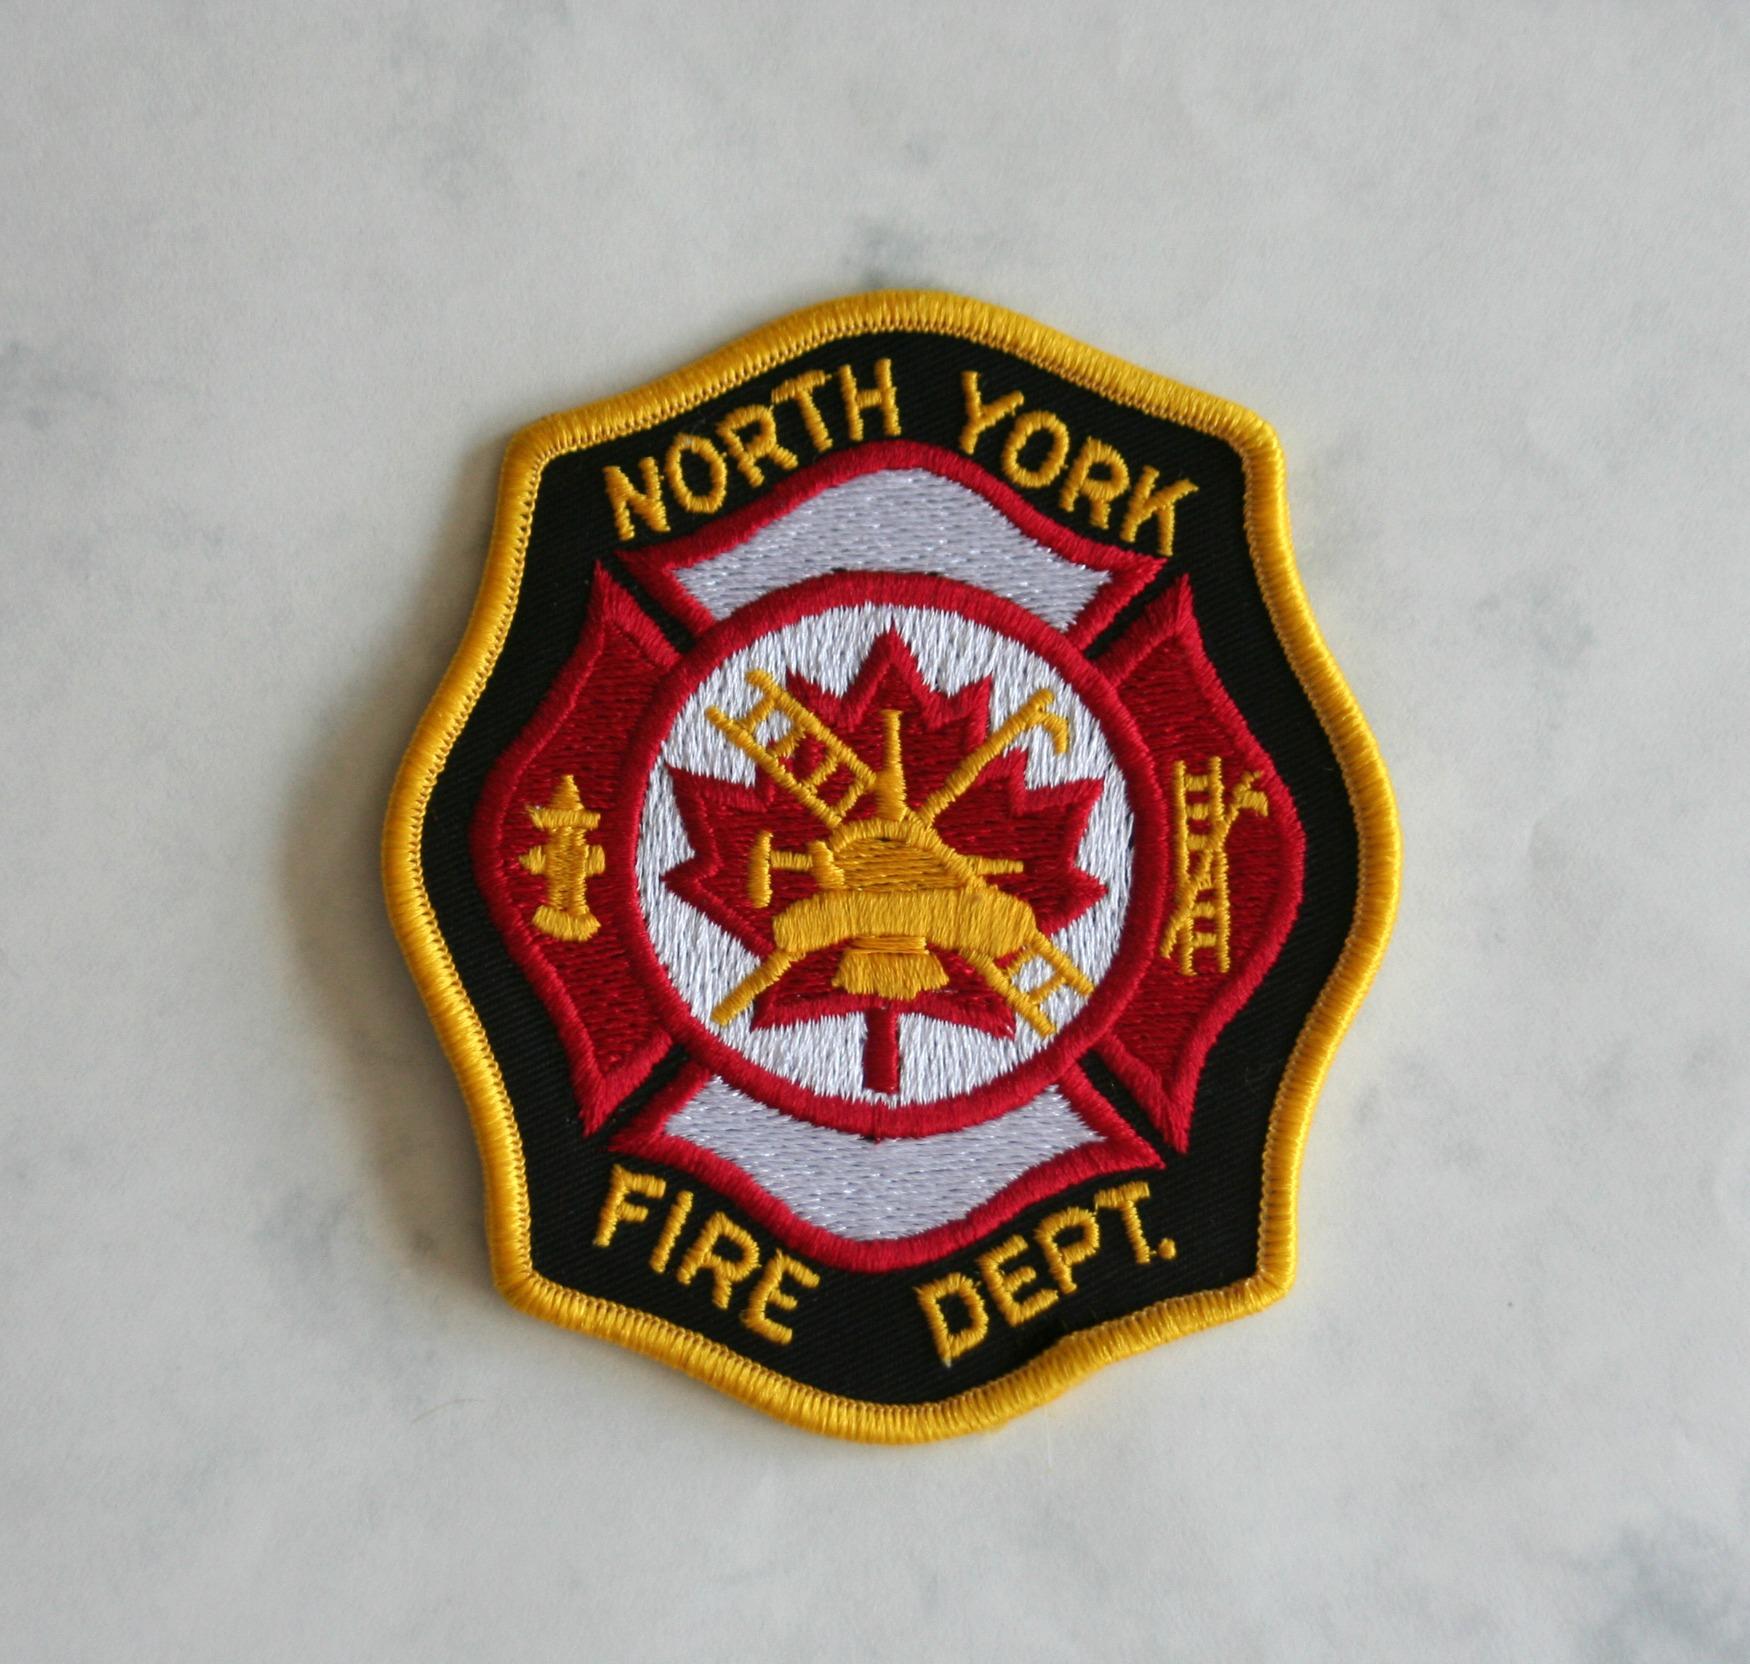 North York, Canada